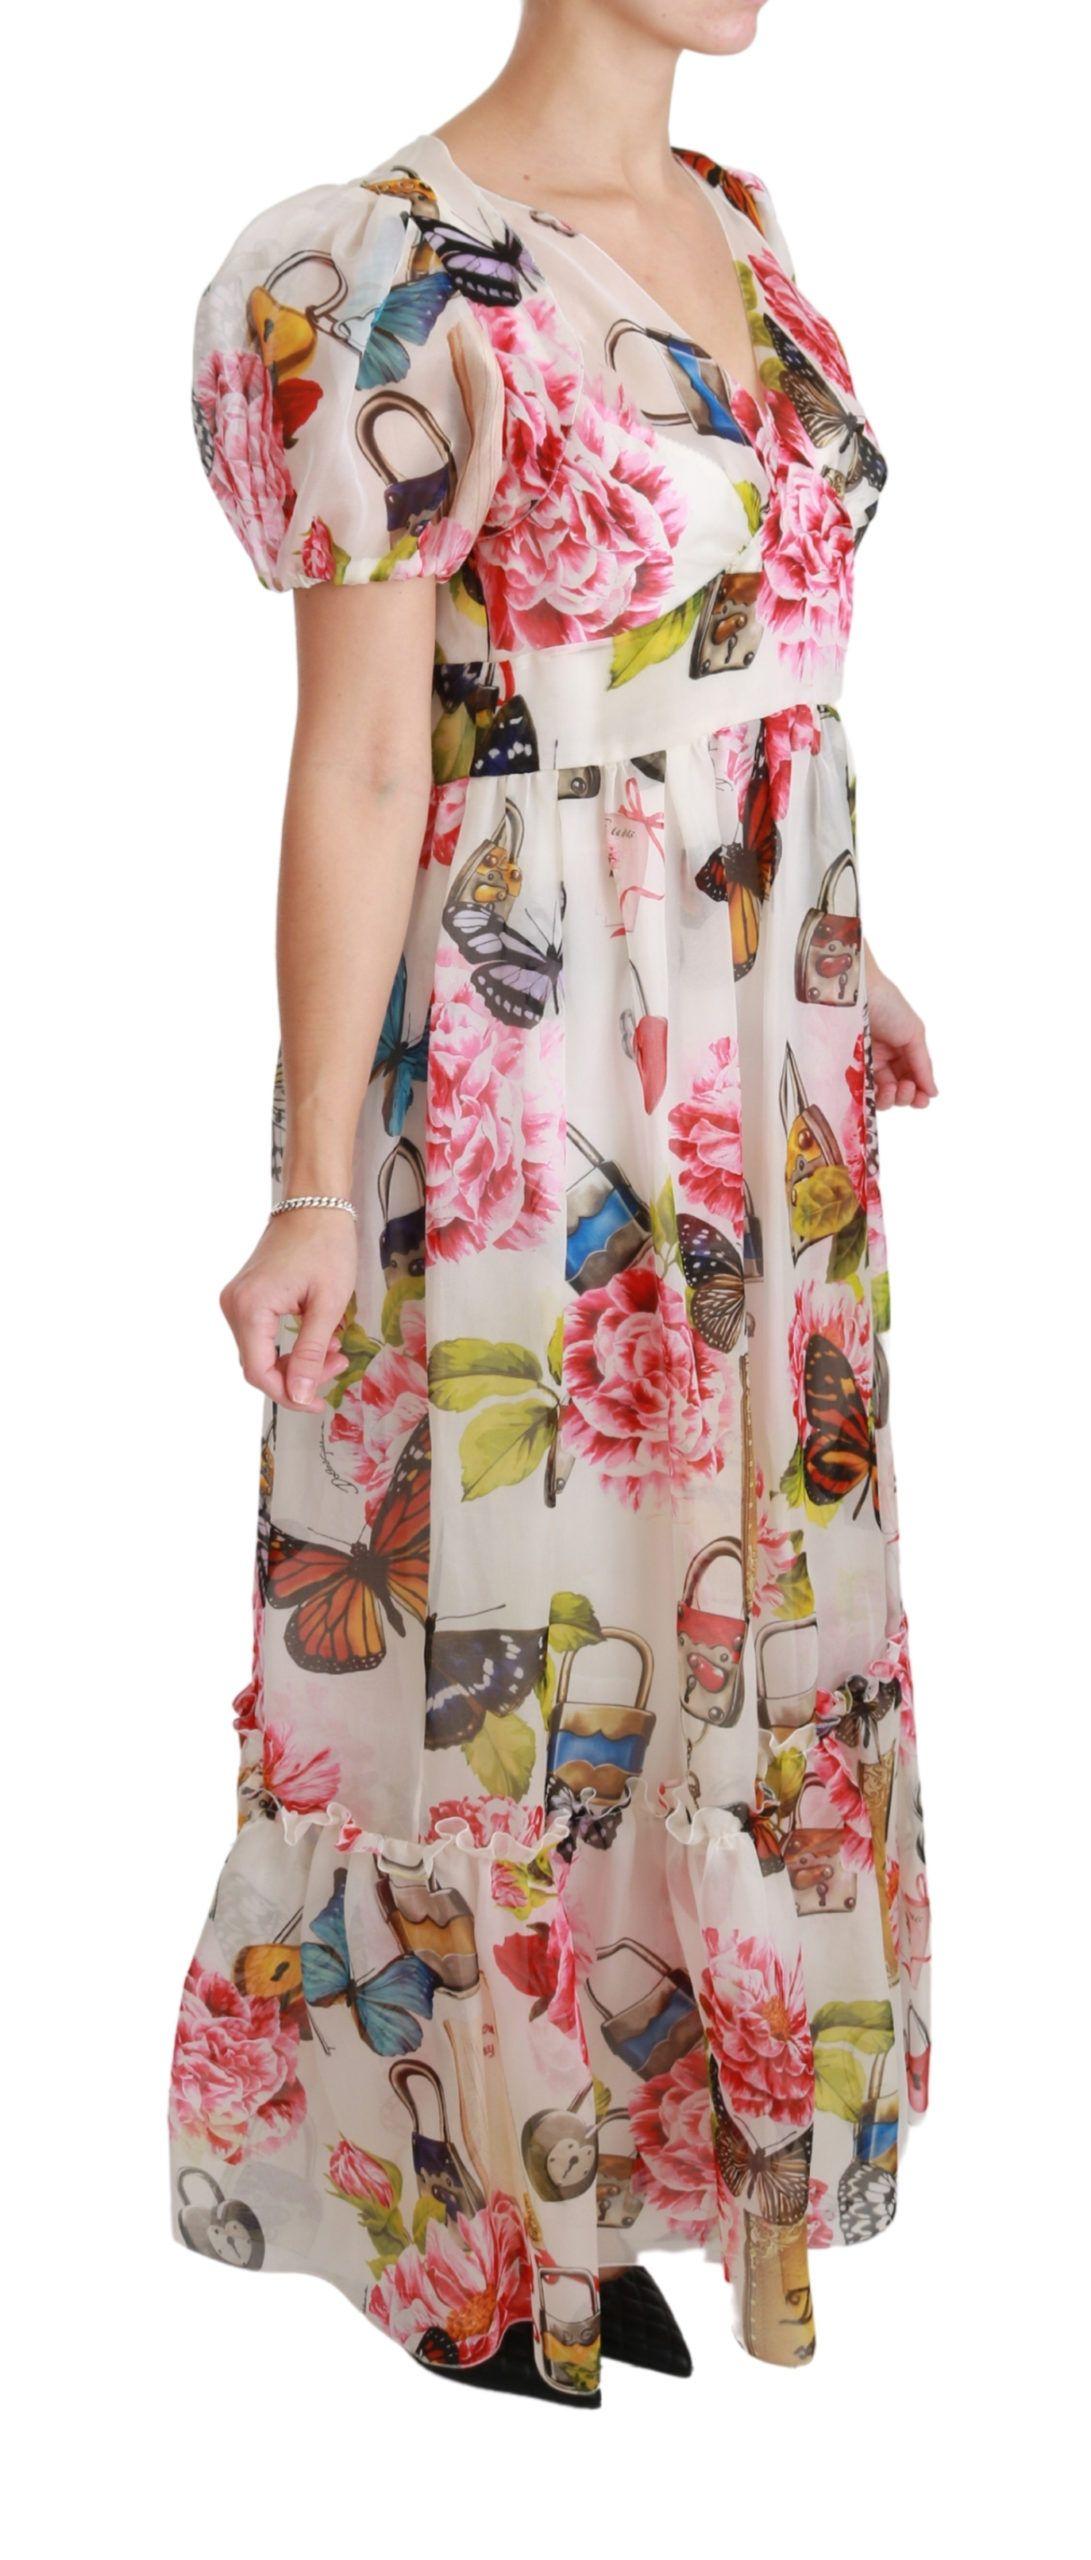 Dolce & Gabbana White Butterfly Padlock Floral Maxi Dress